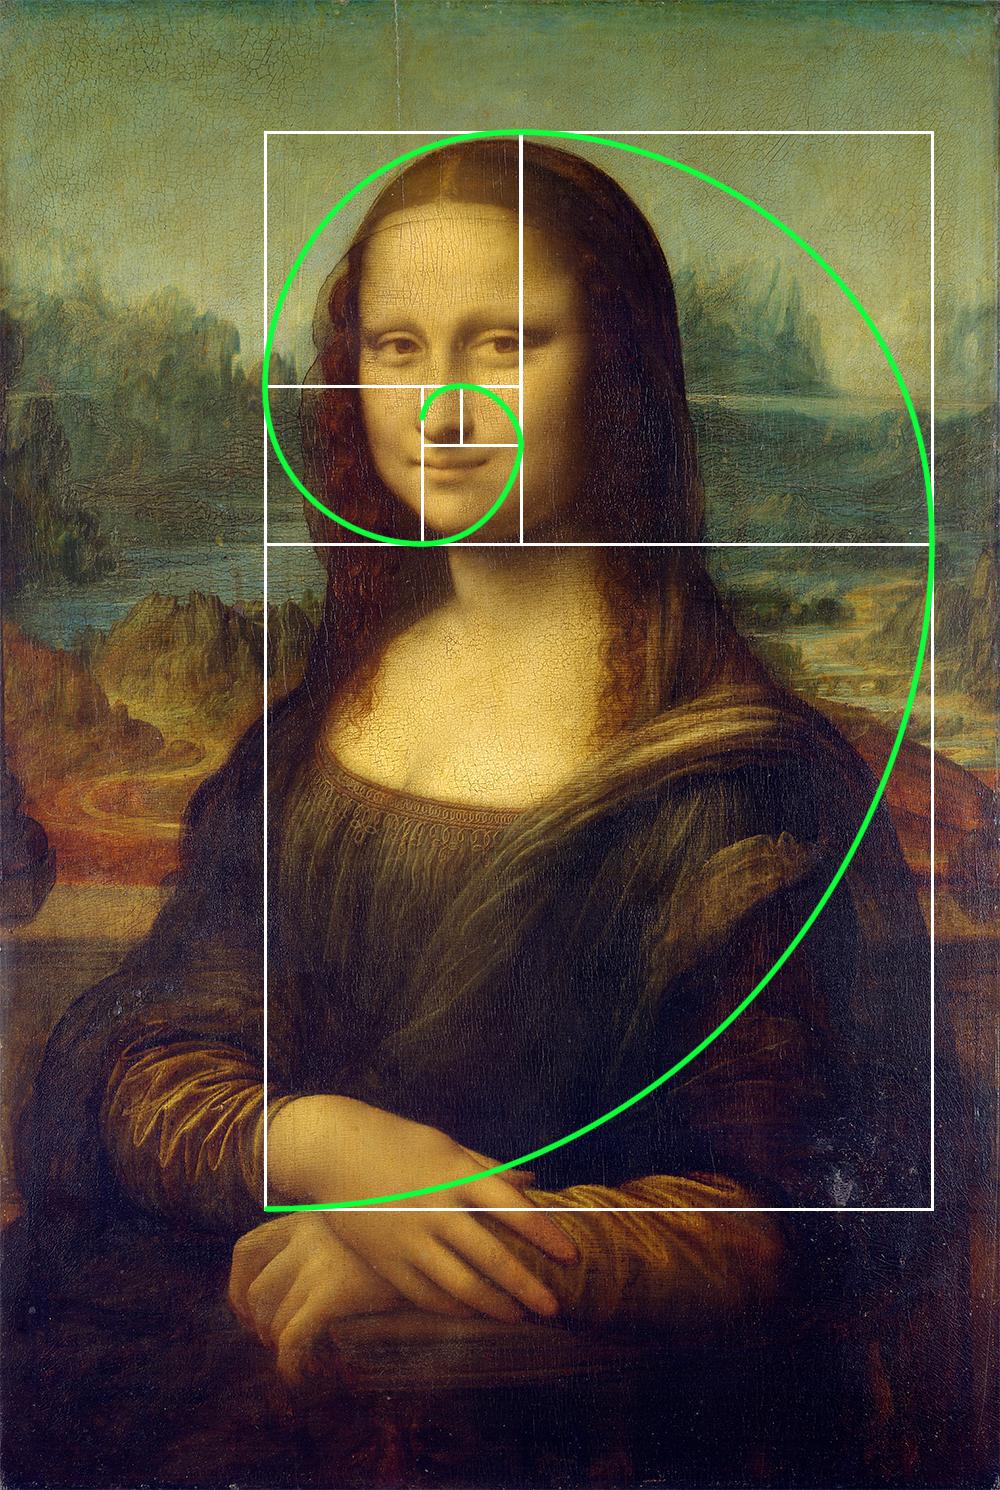 mona_lis_golden_ratio.jpg